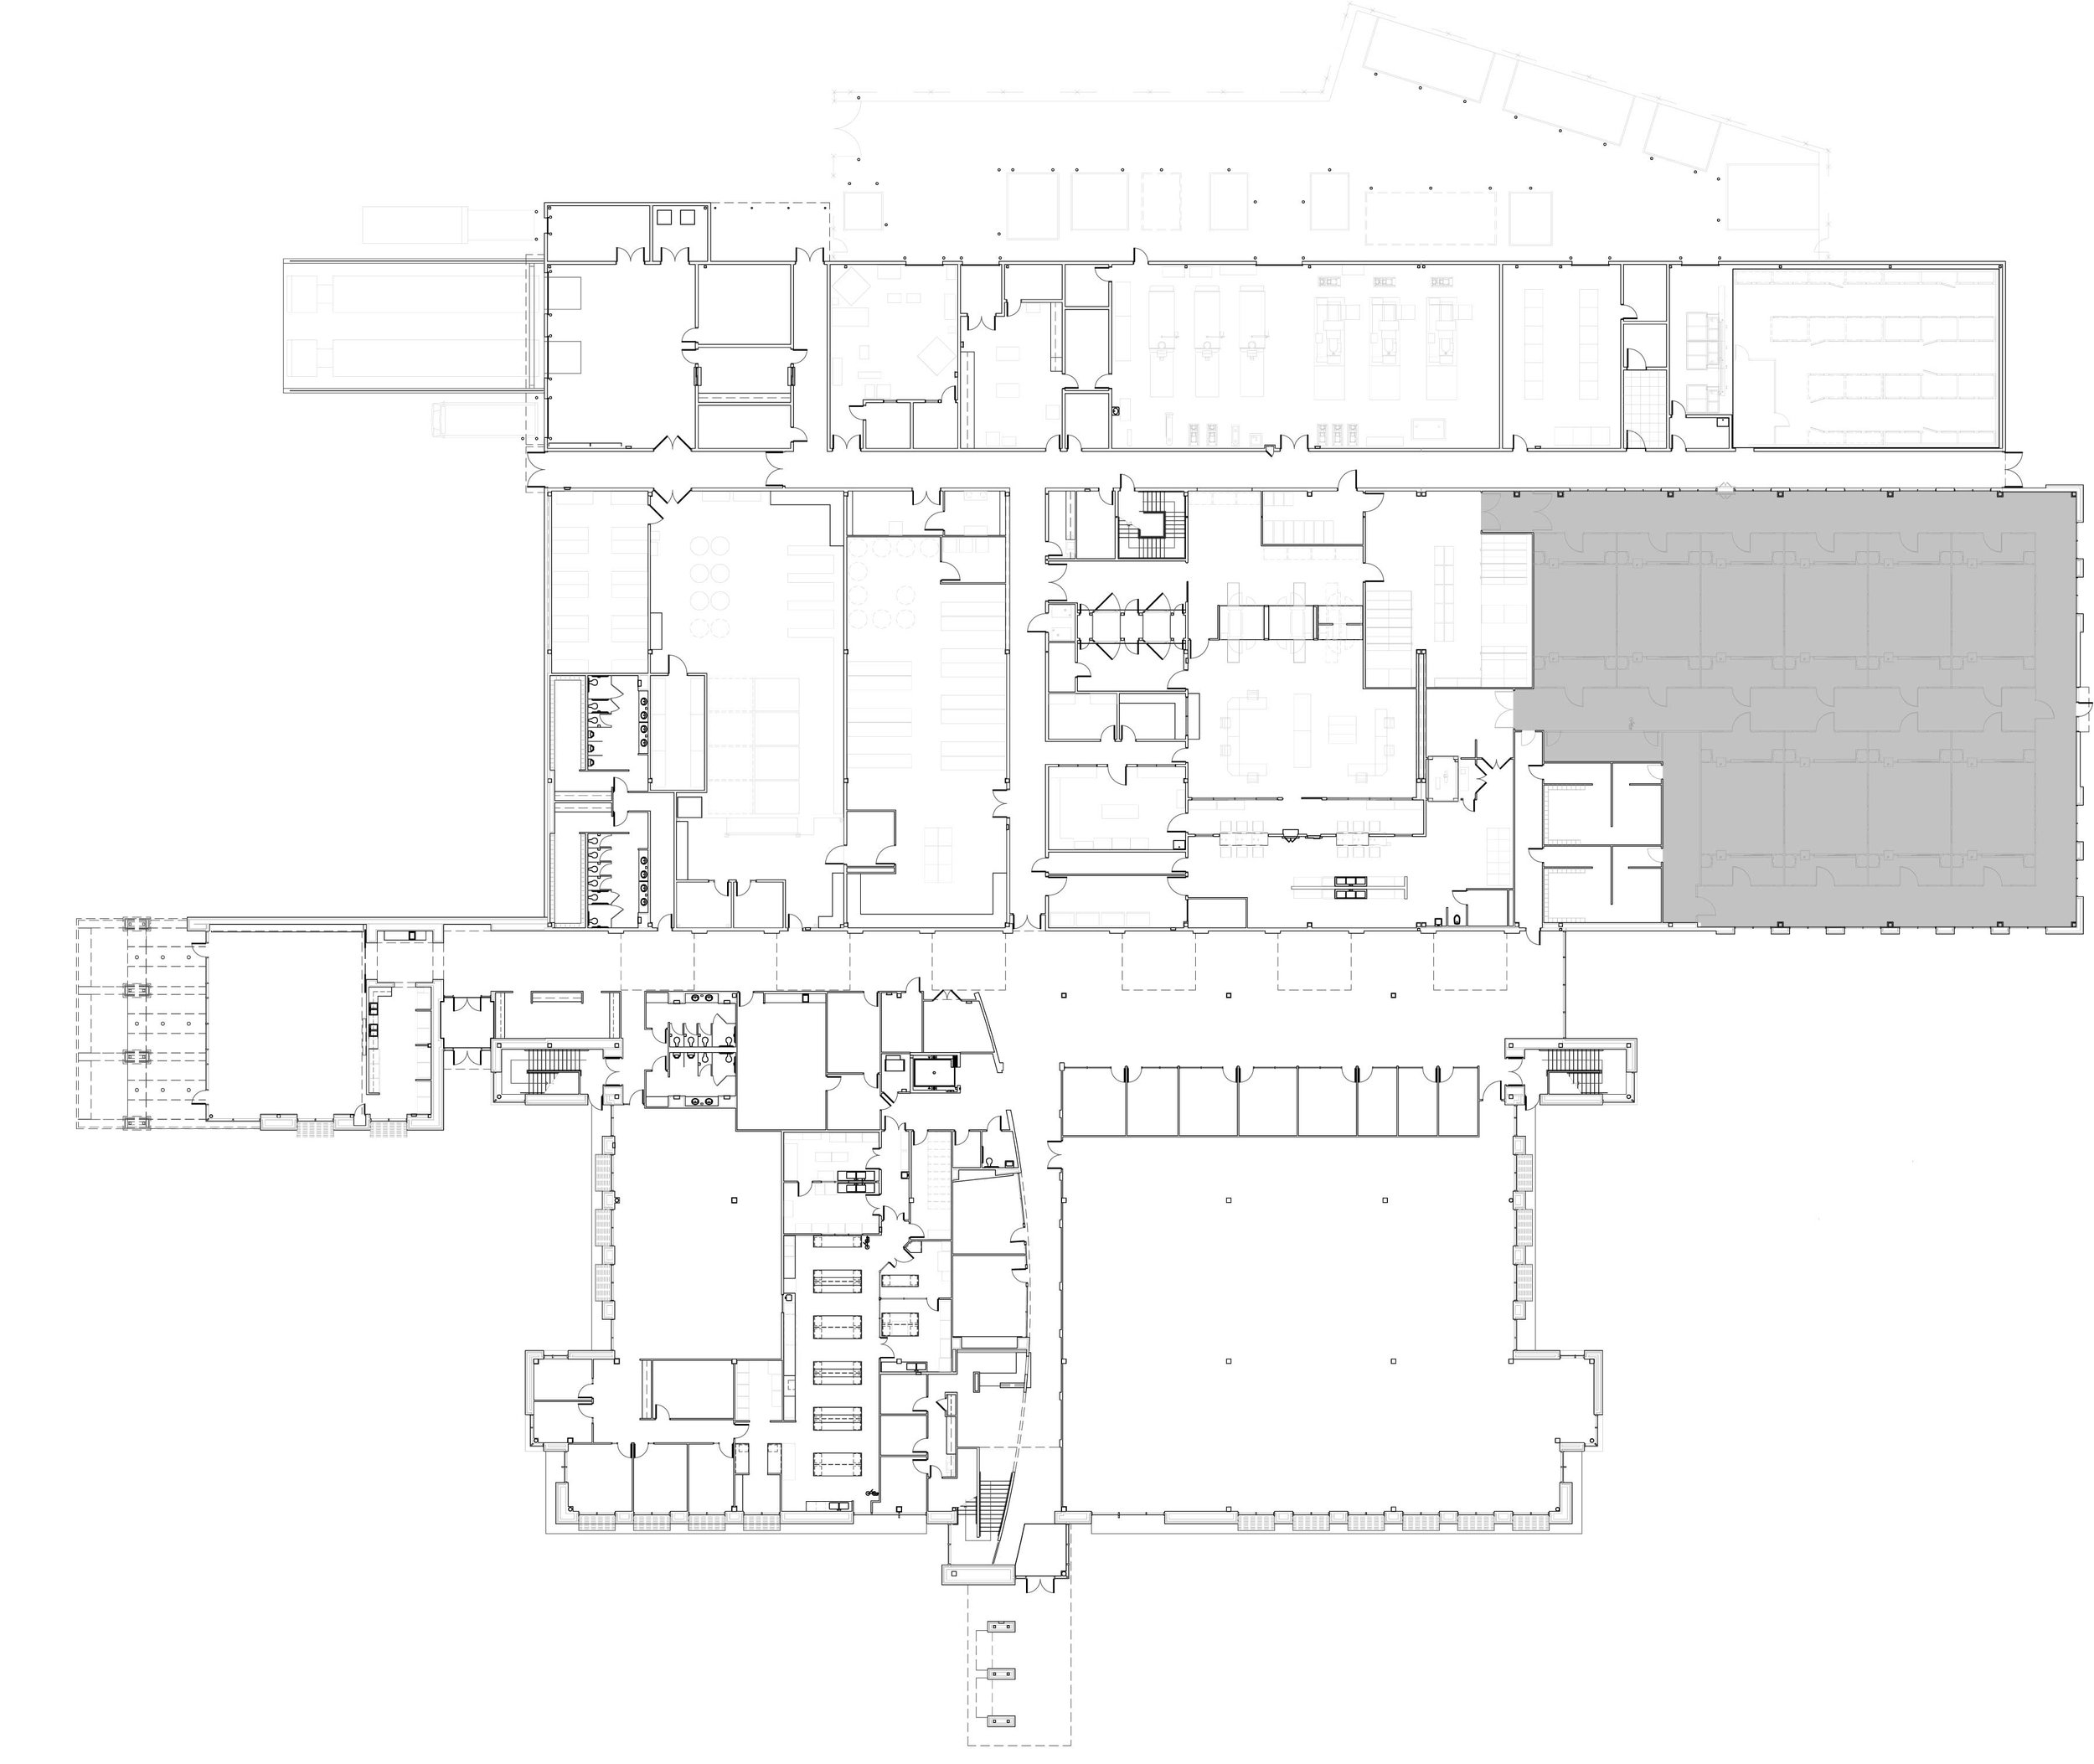 Life Net Health Corporate Headquarters - First Floor Plan